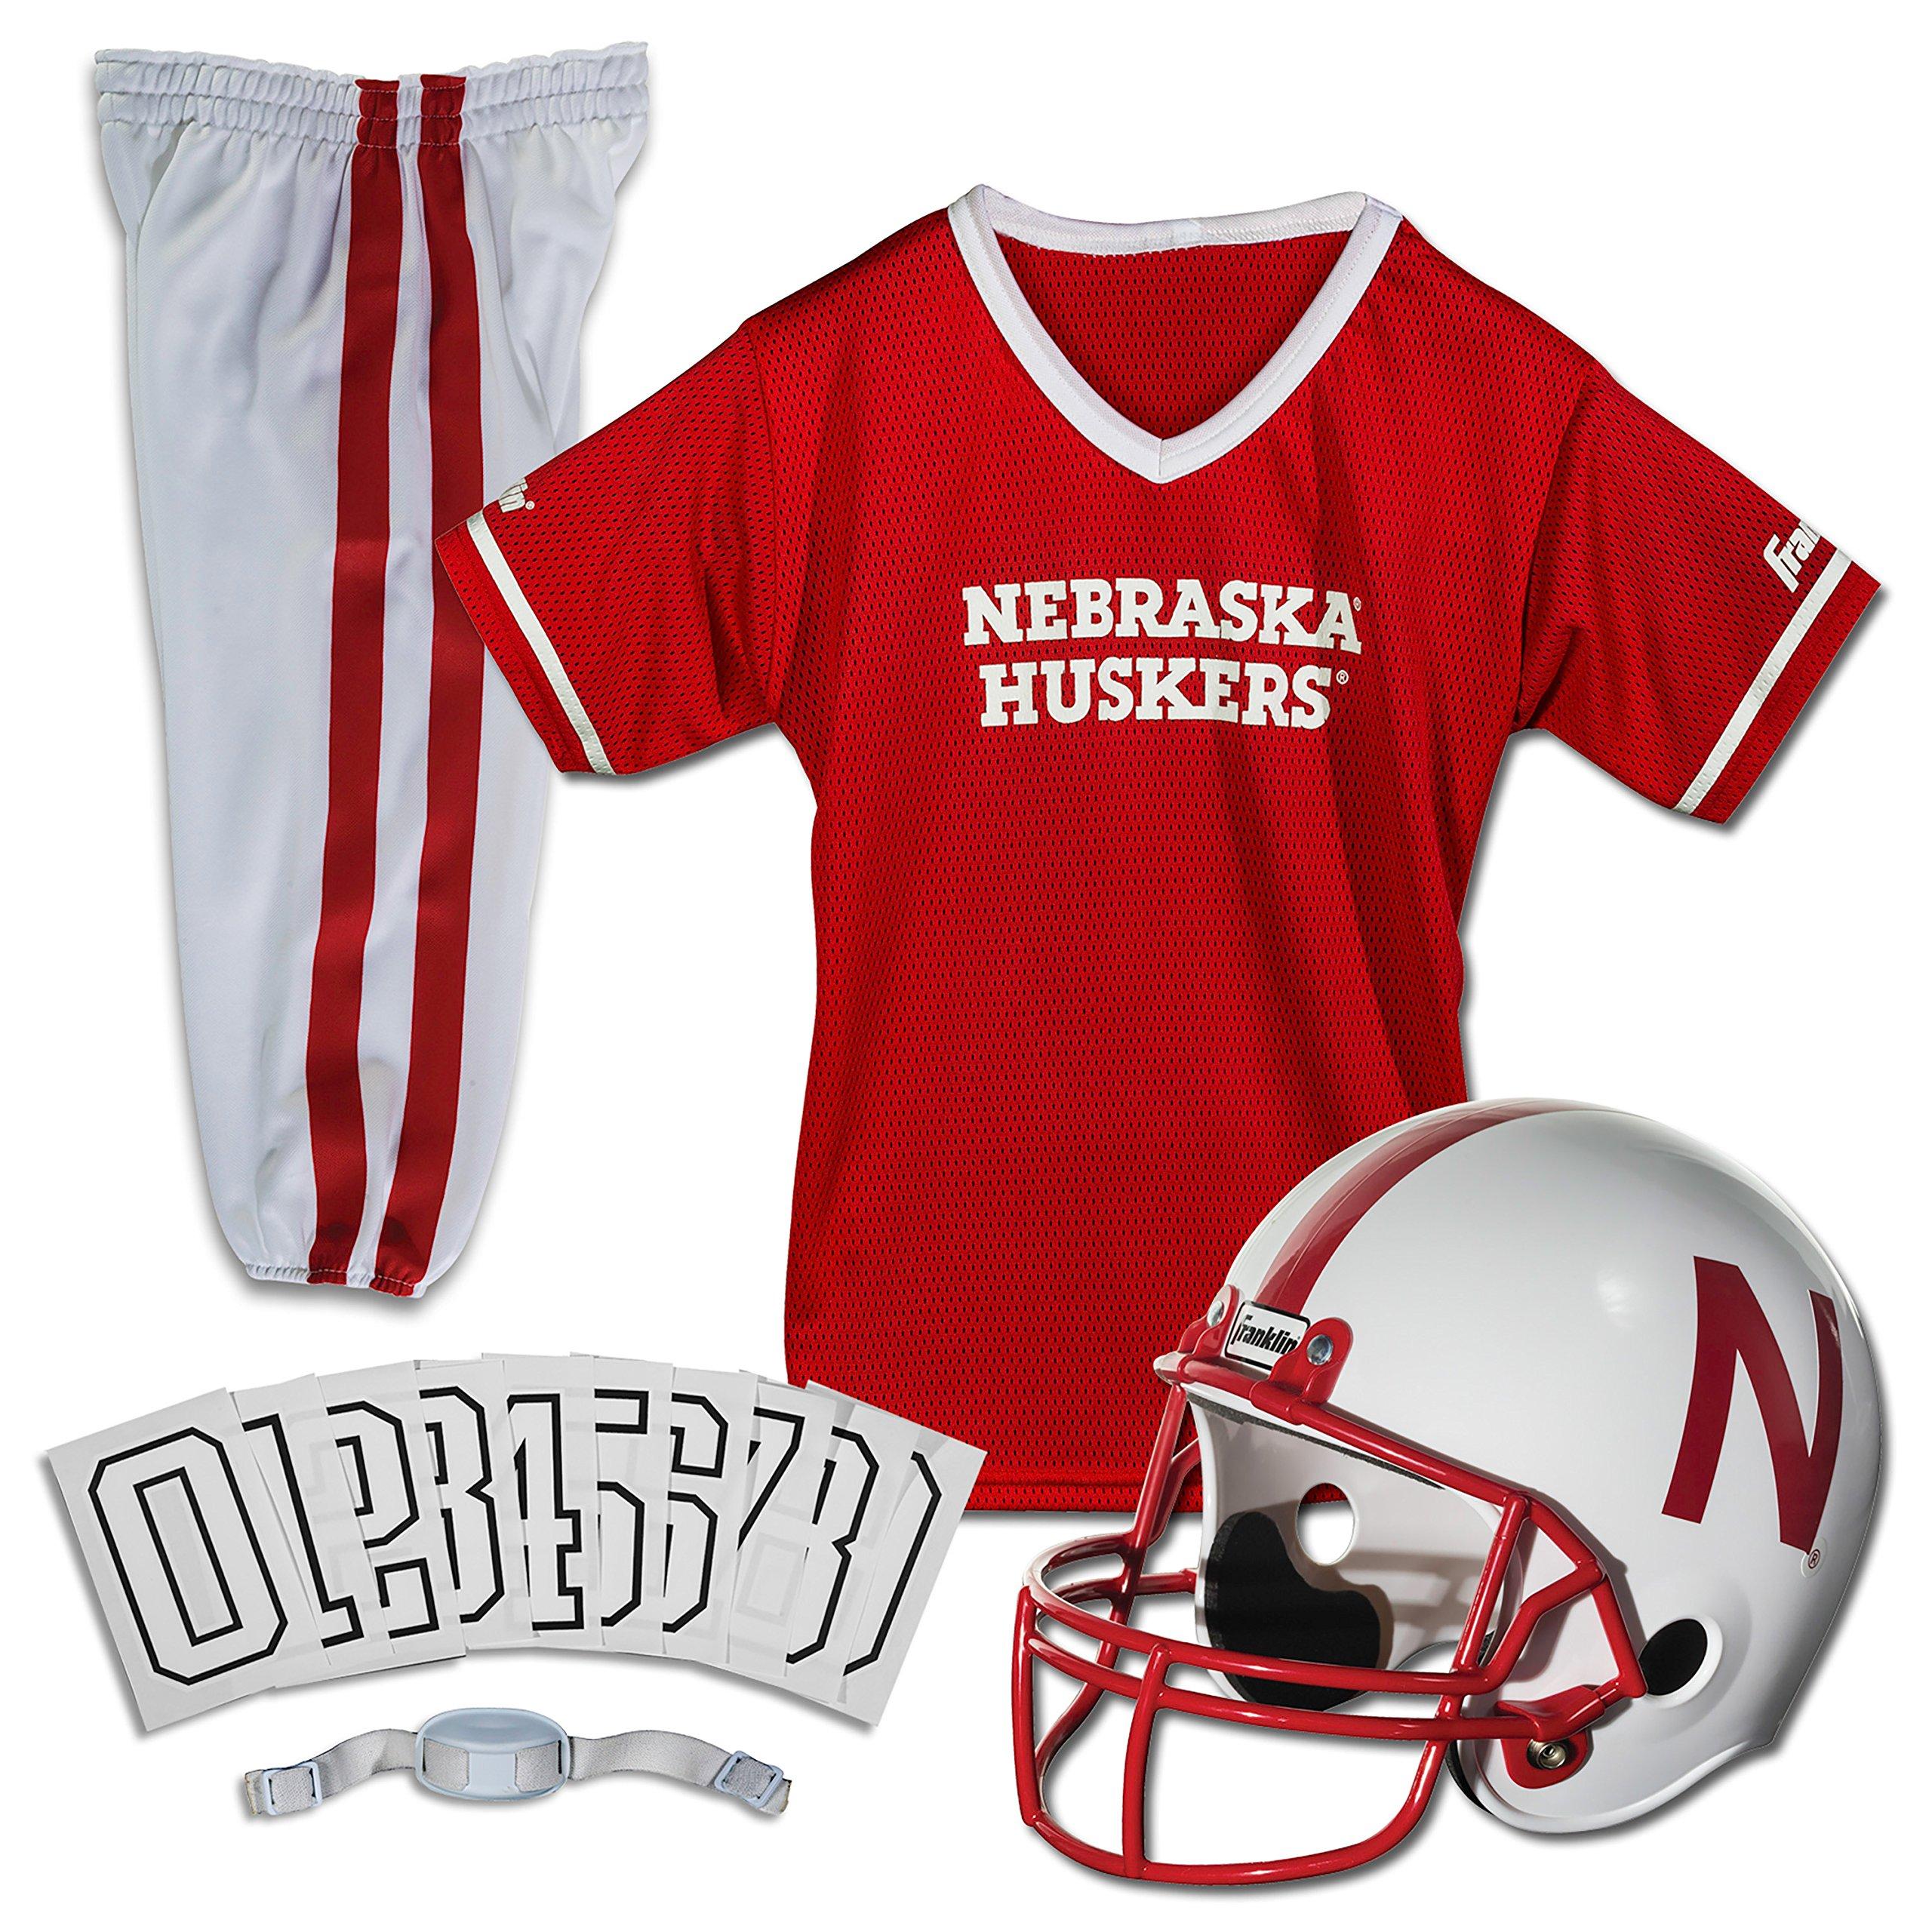 Franklin Sports NCAA Nebraska Cornhuskers Deluxe Youth Team Uniform Set, Small